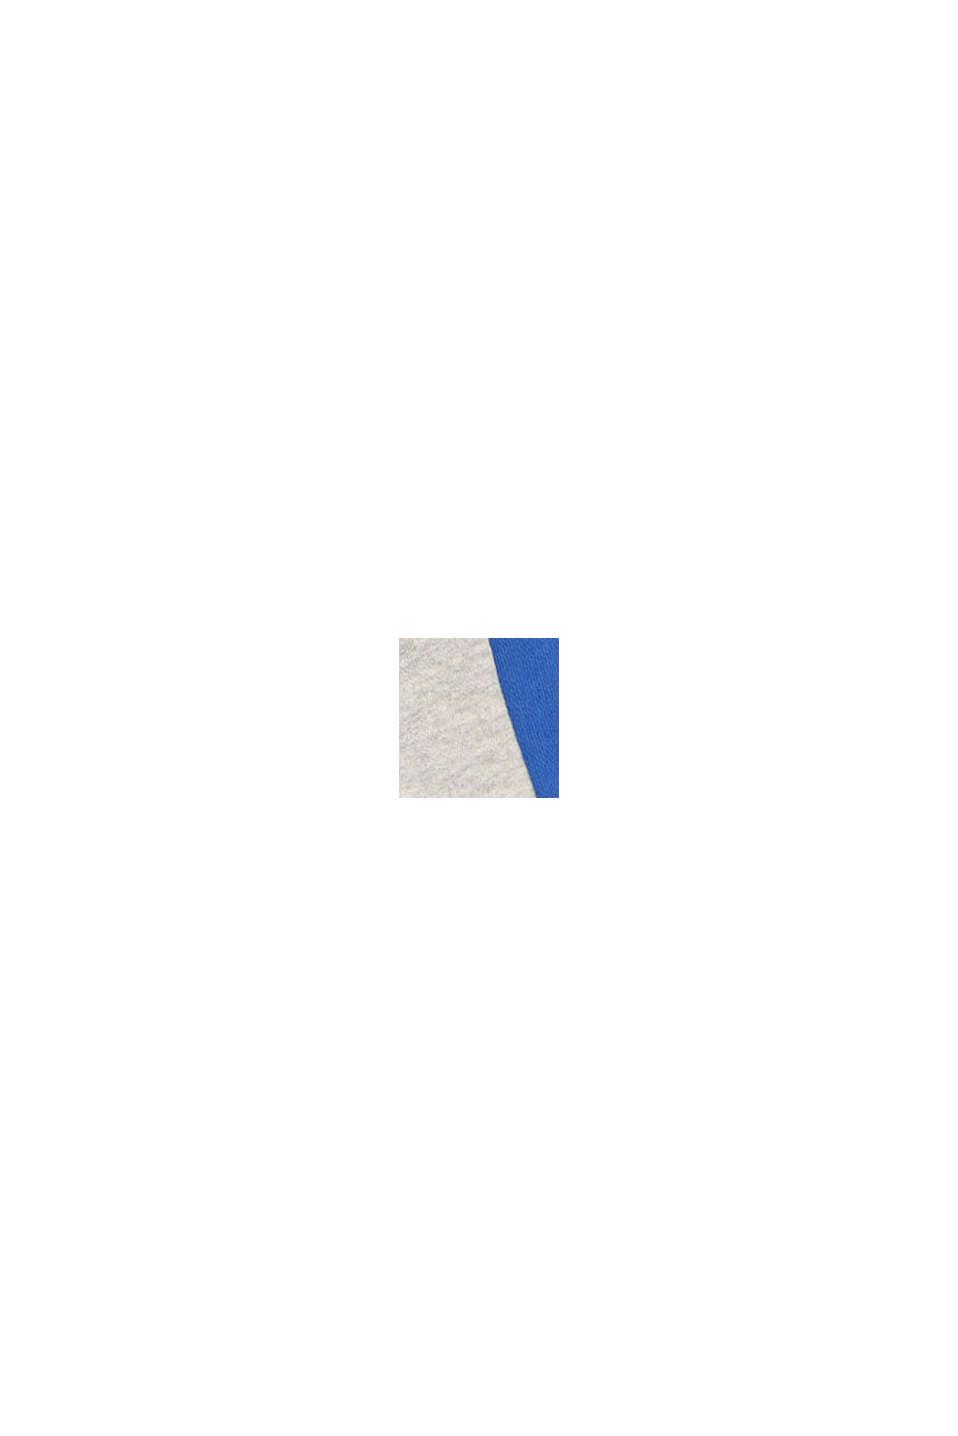 Sweat-Bermudas mit Color Block, 100% Baumwolle, MEDIUM GREY, swatch